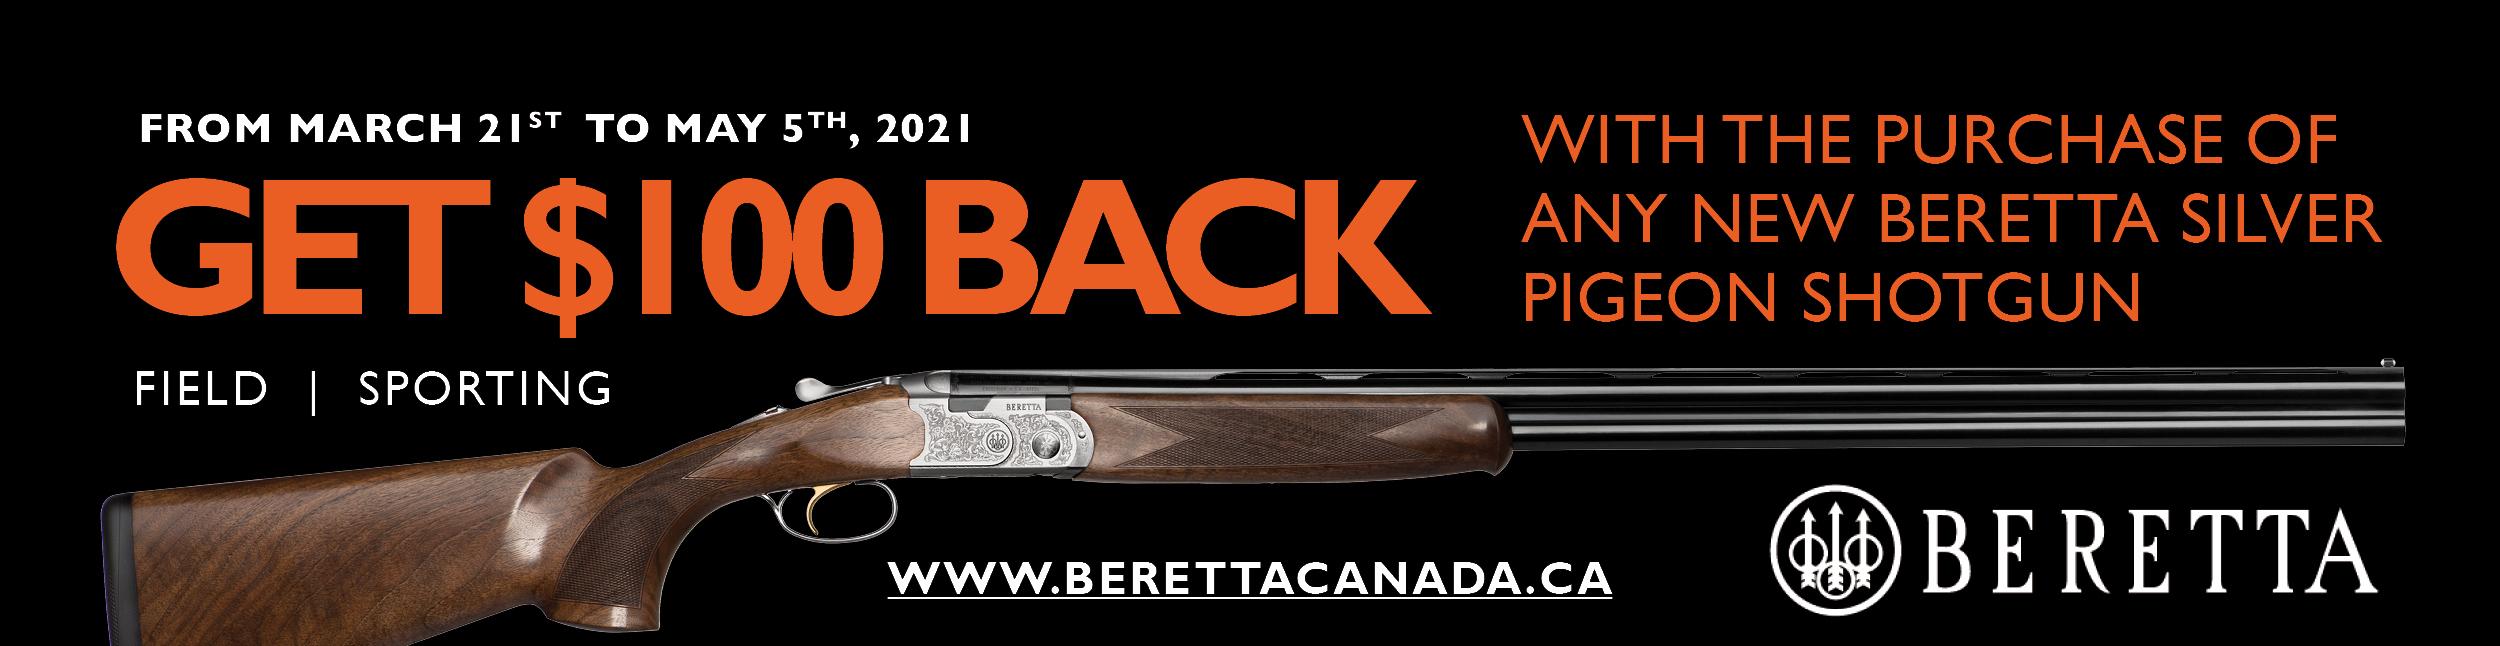 Beretta 100 Off SP Promotion 2021 Banner 600x155